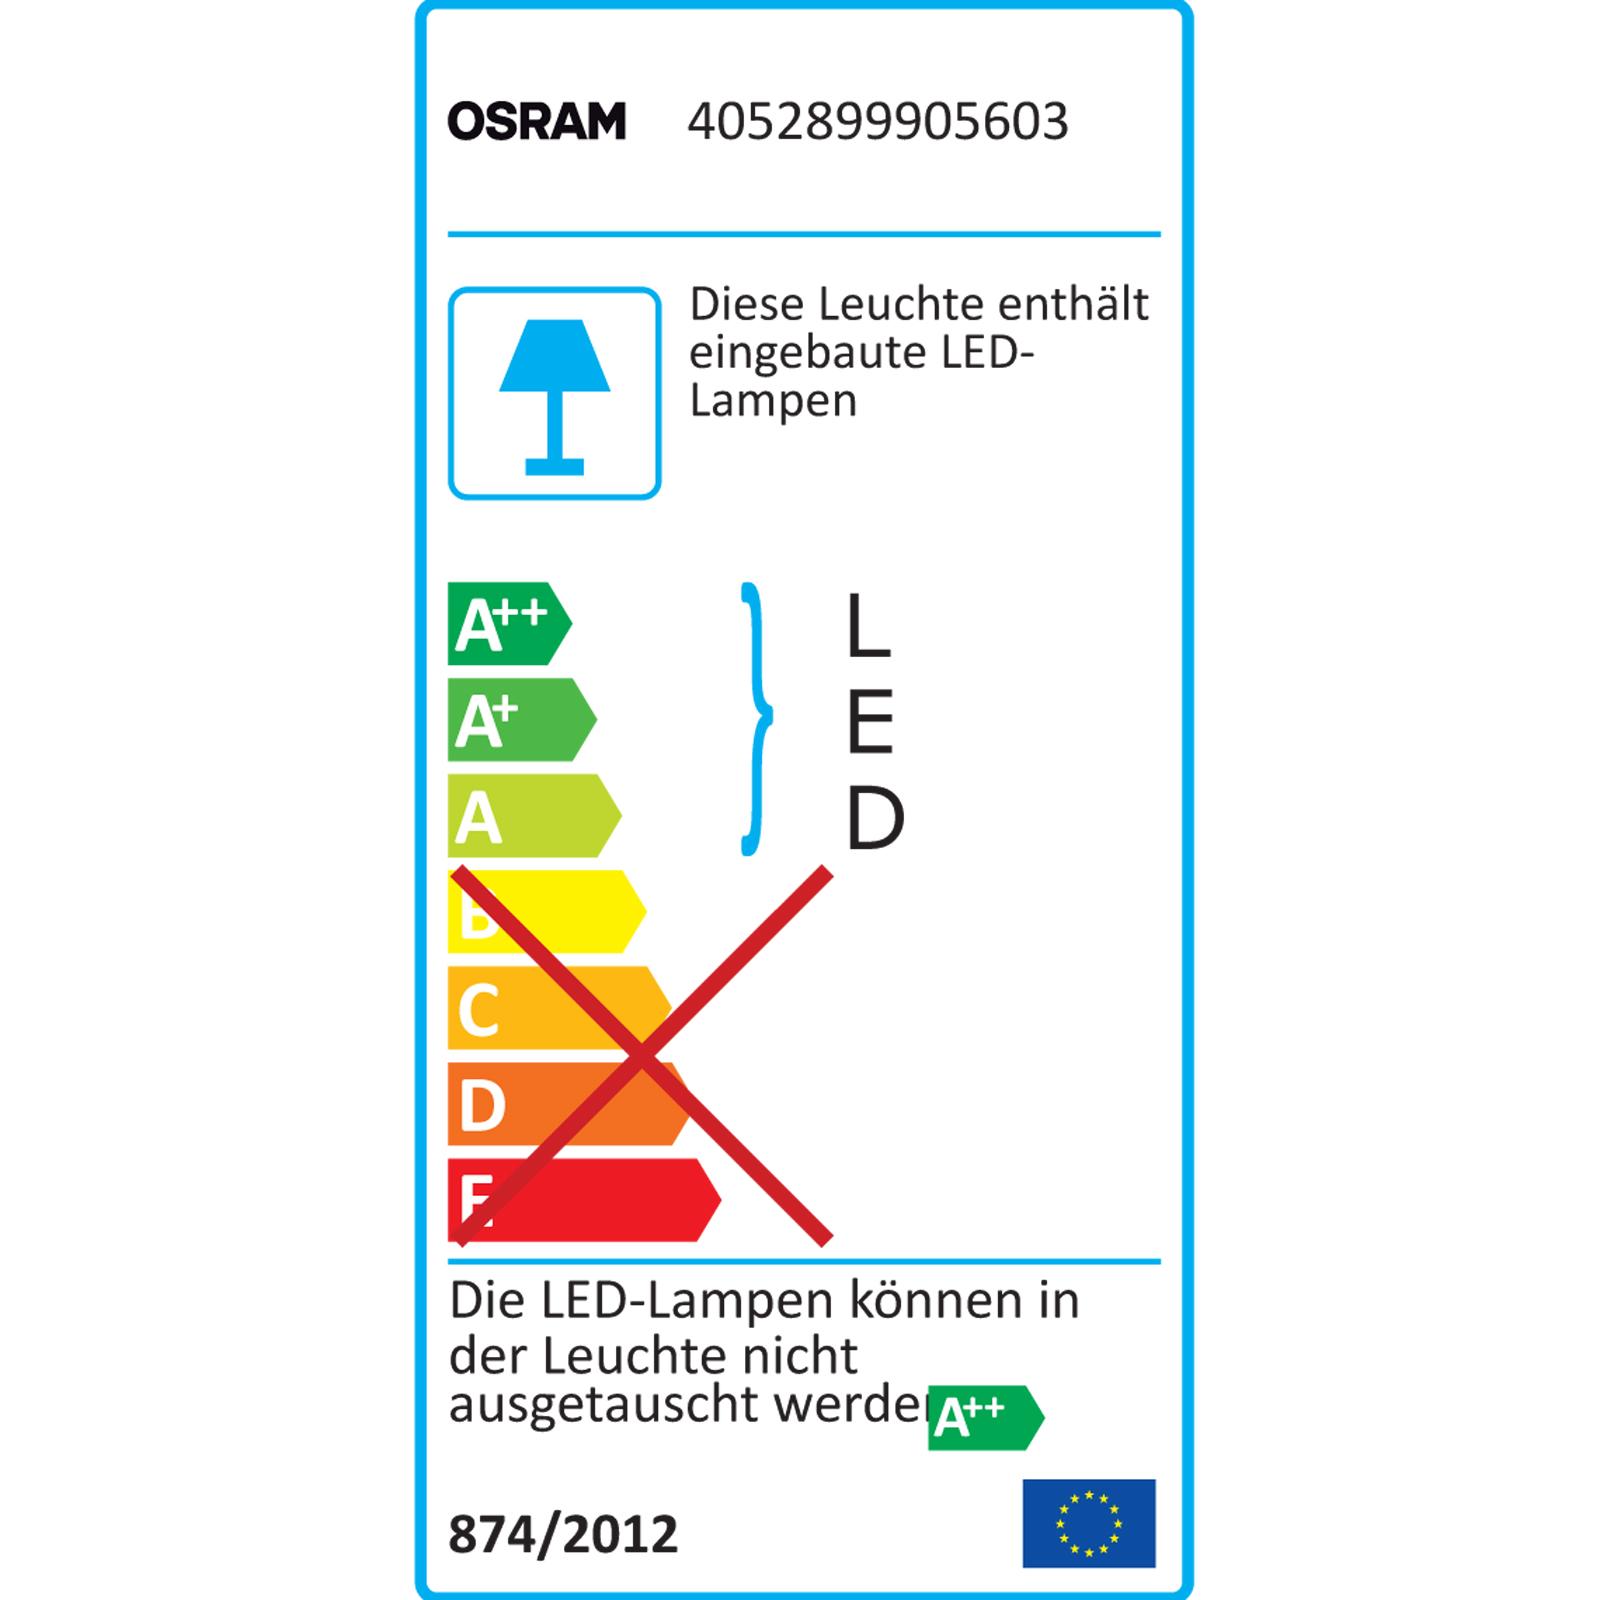 osram noxlite led hp floodlight 23 watt 3000k 2 bewegungsmelder schwenkbar grau ebay. Black Bedroom Furniture Sets. Home Design Ideas